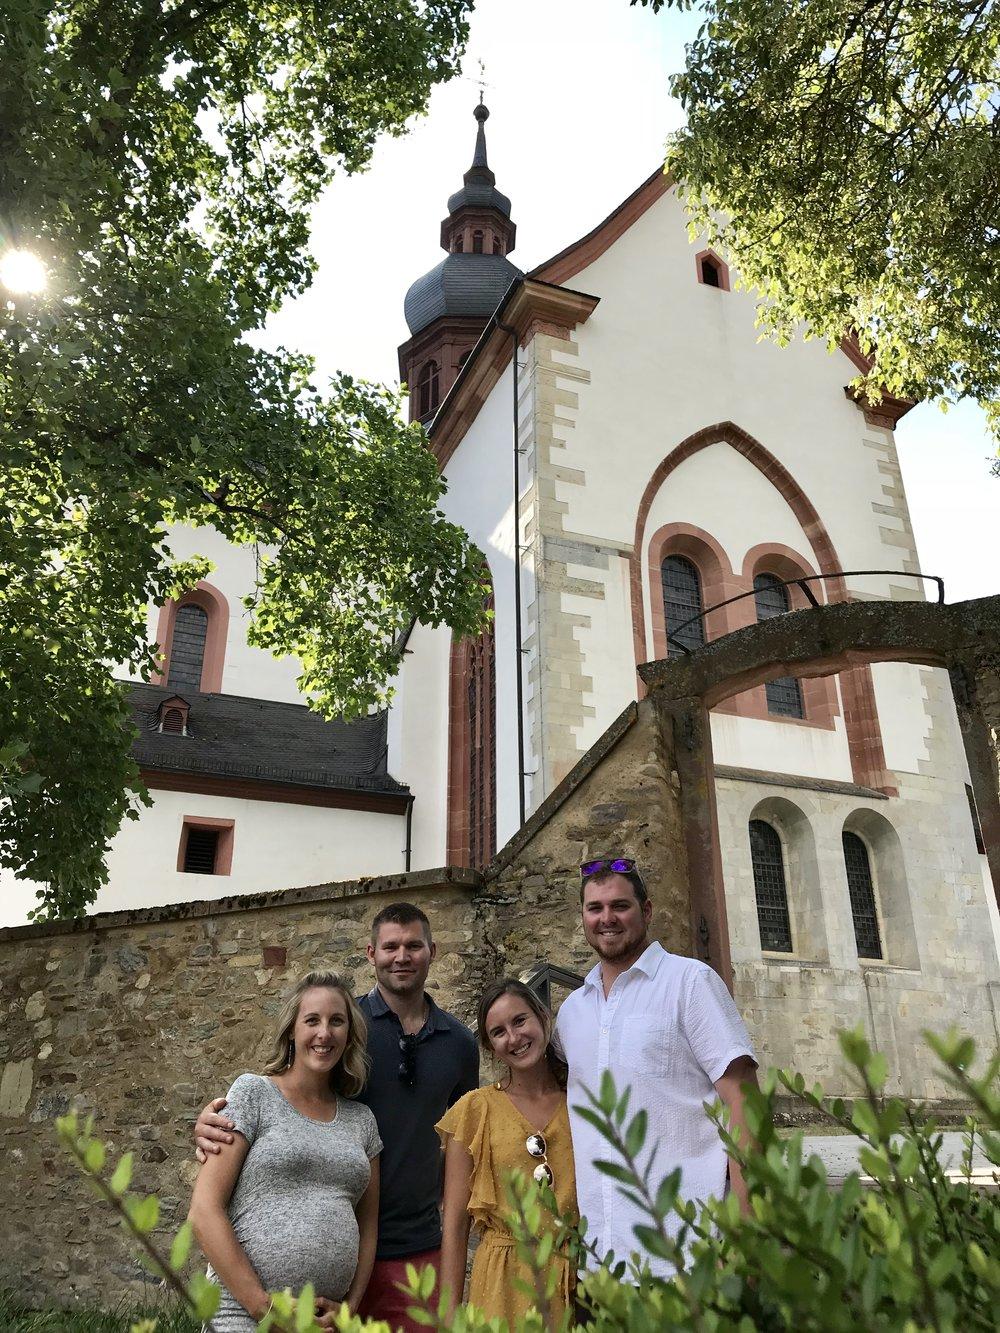 Kloster Eberbach Germany Honeymoon.jpg